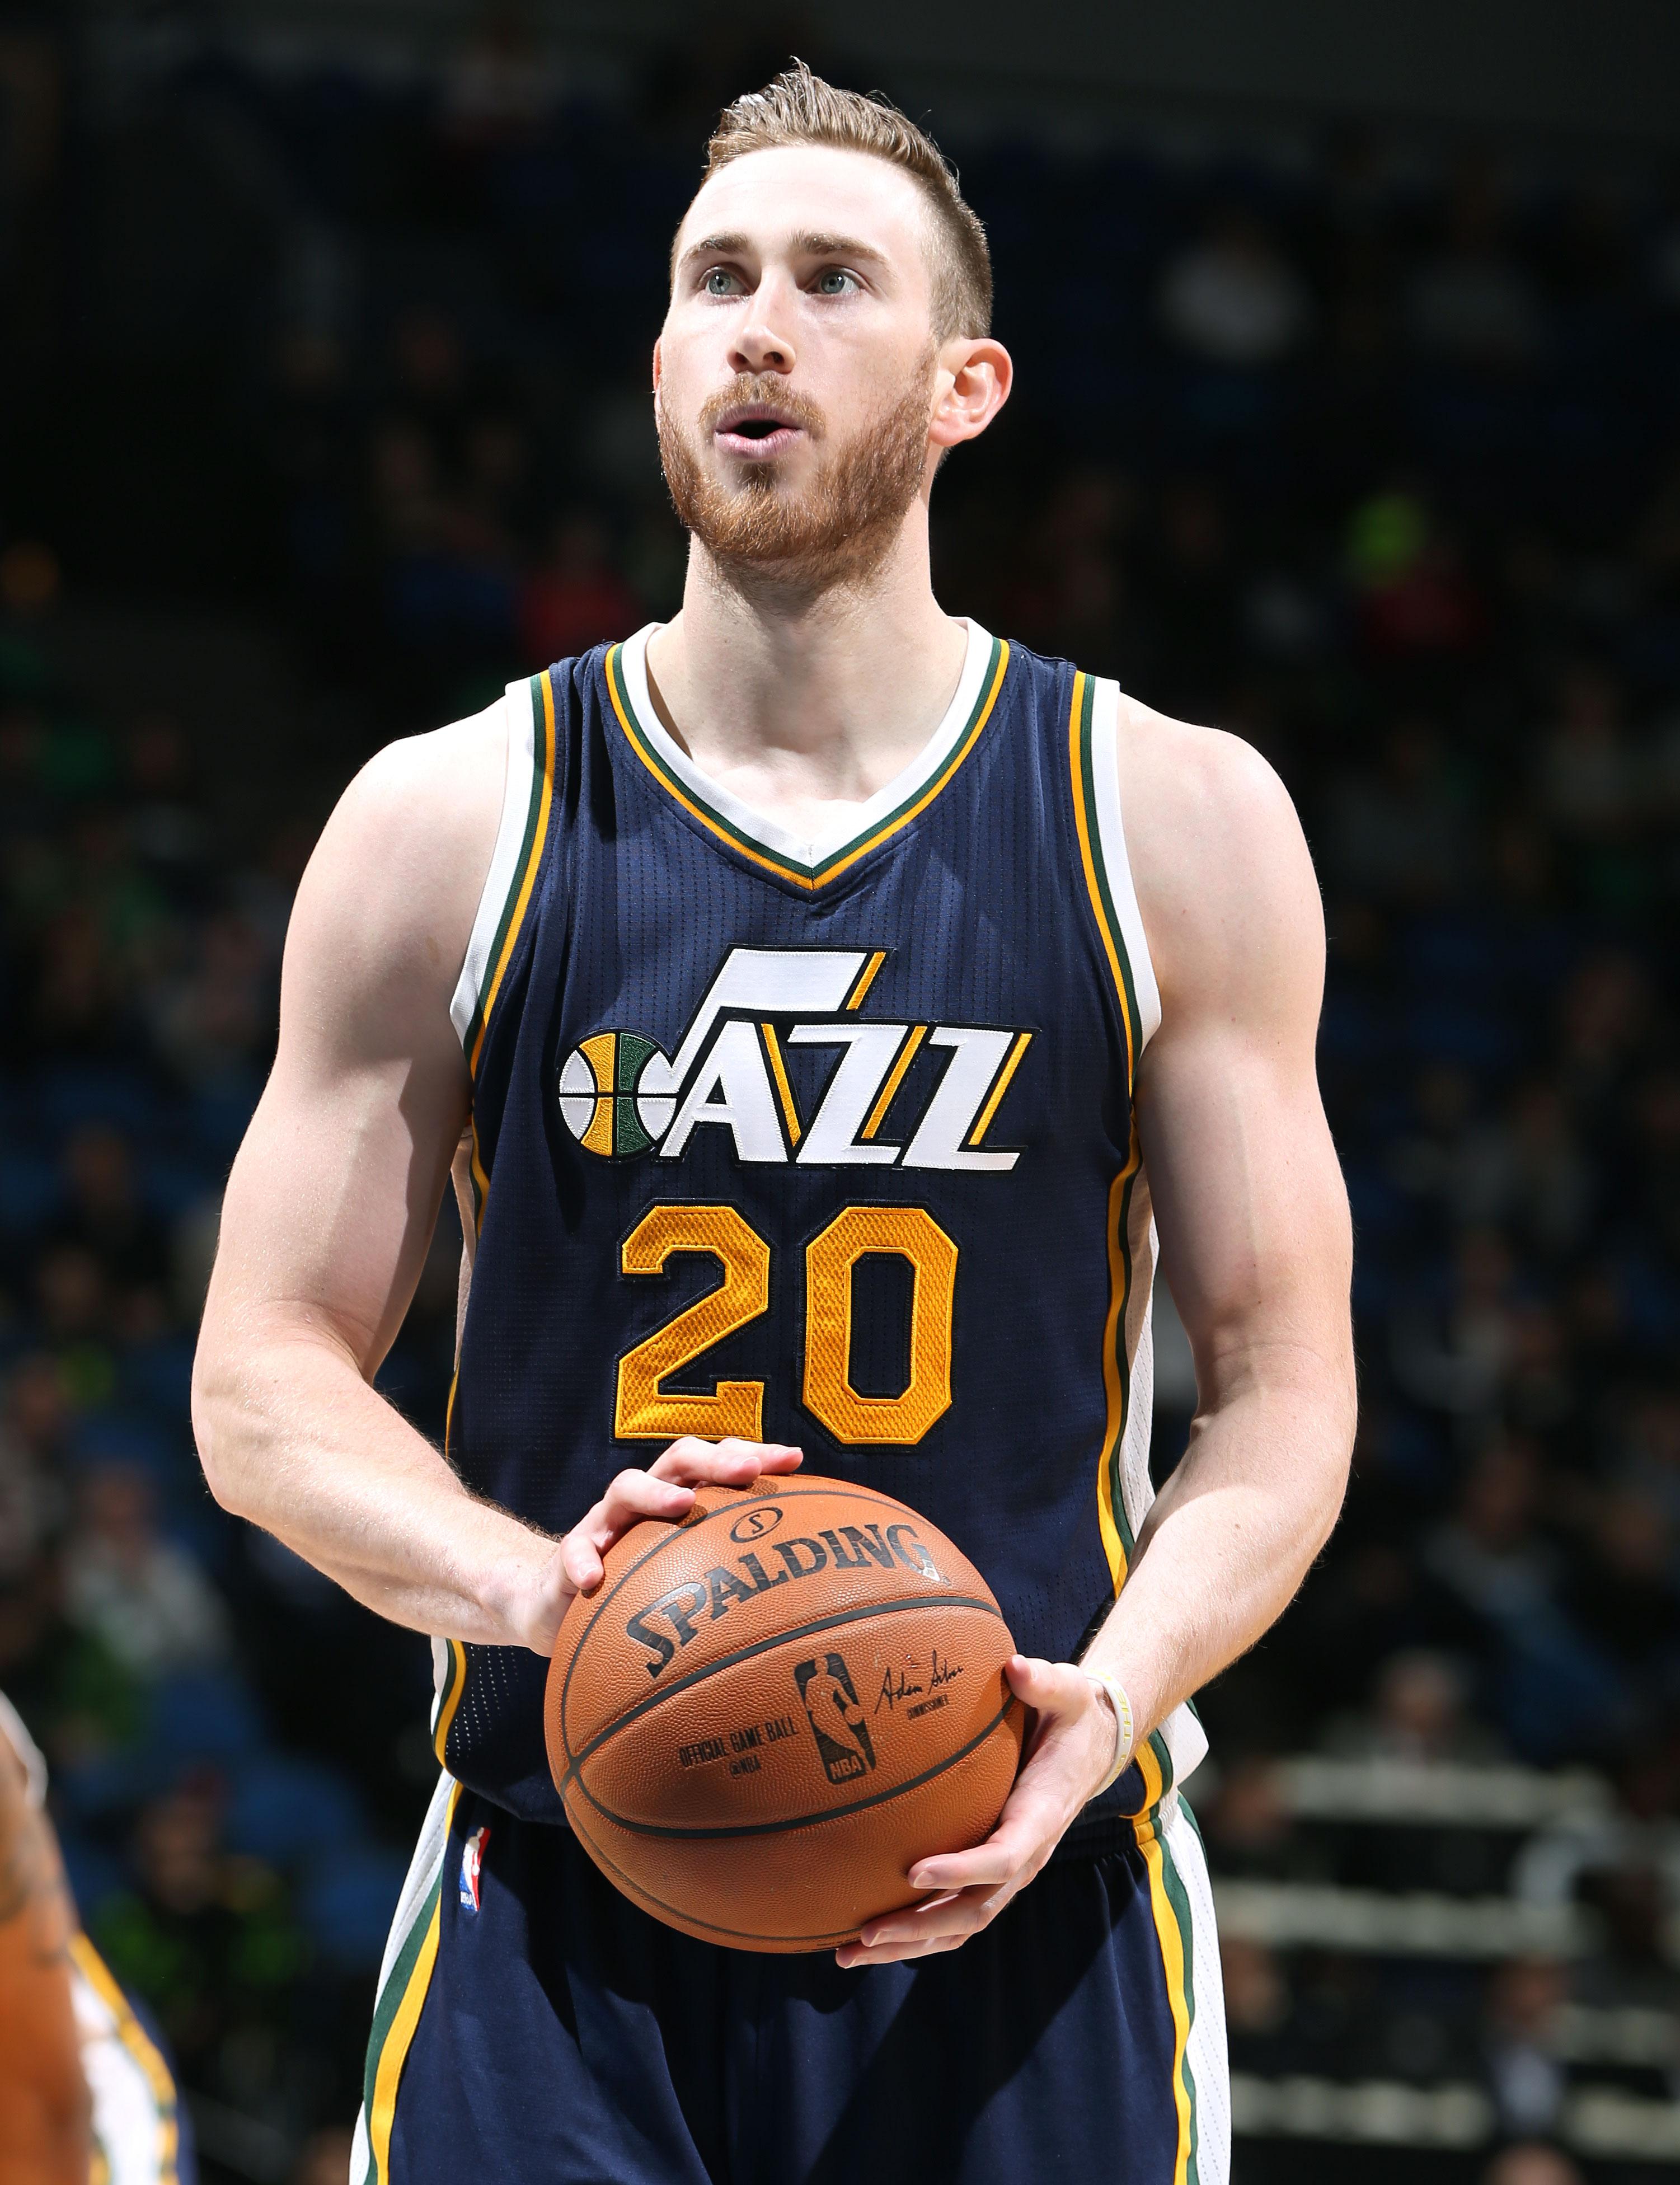 Utah Jazz Basketball Player Gets Haircut Becomes Hot